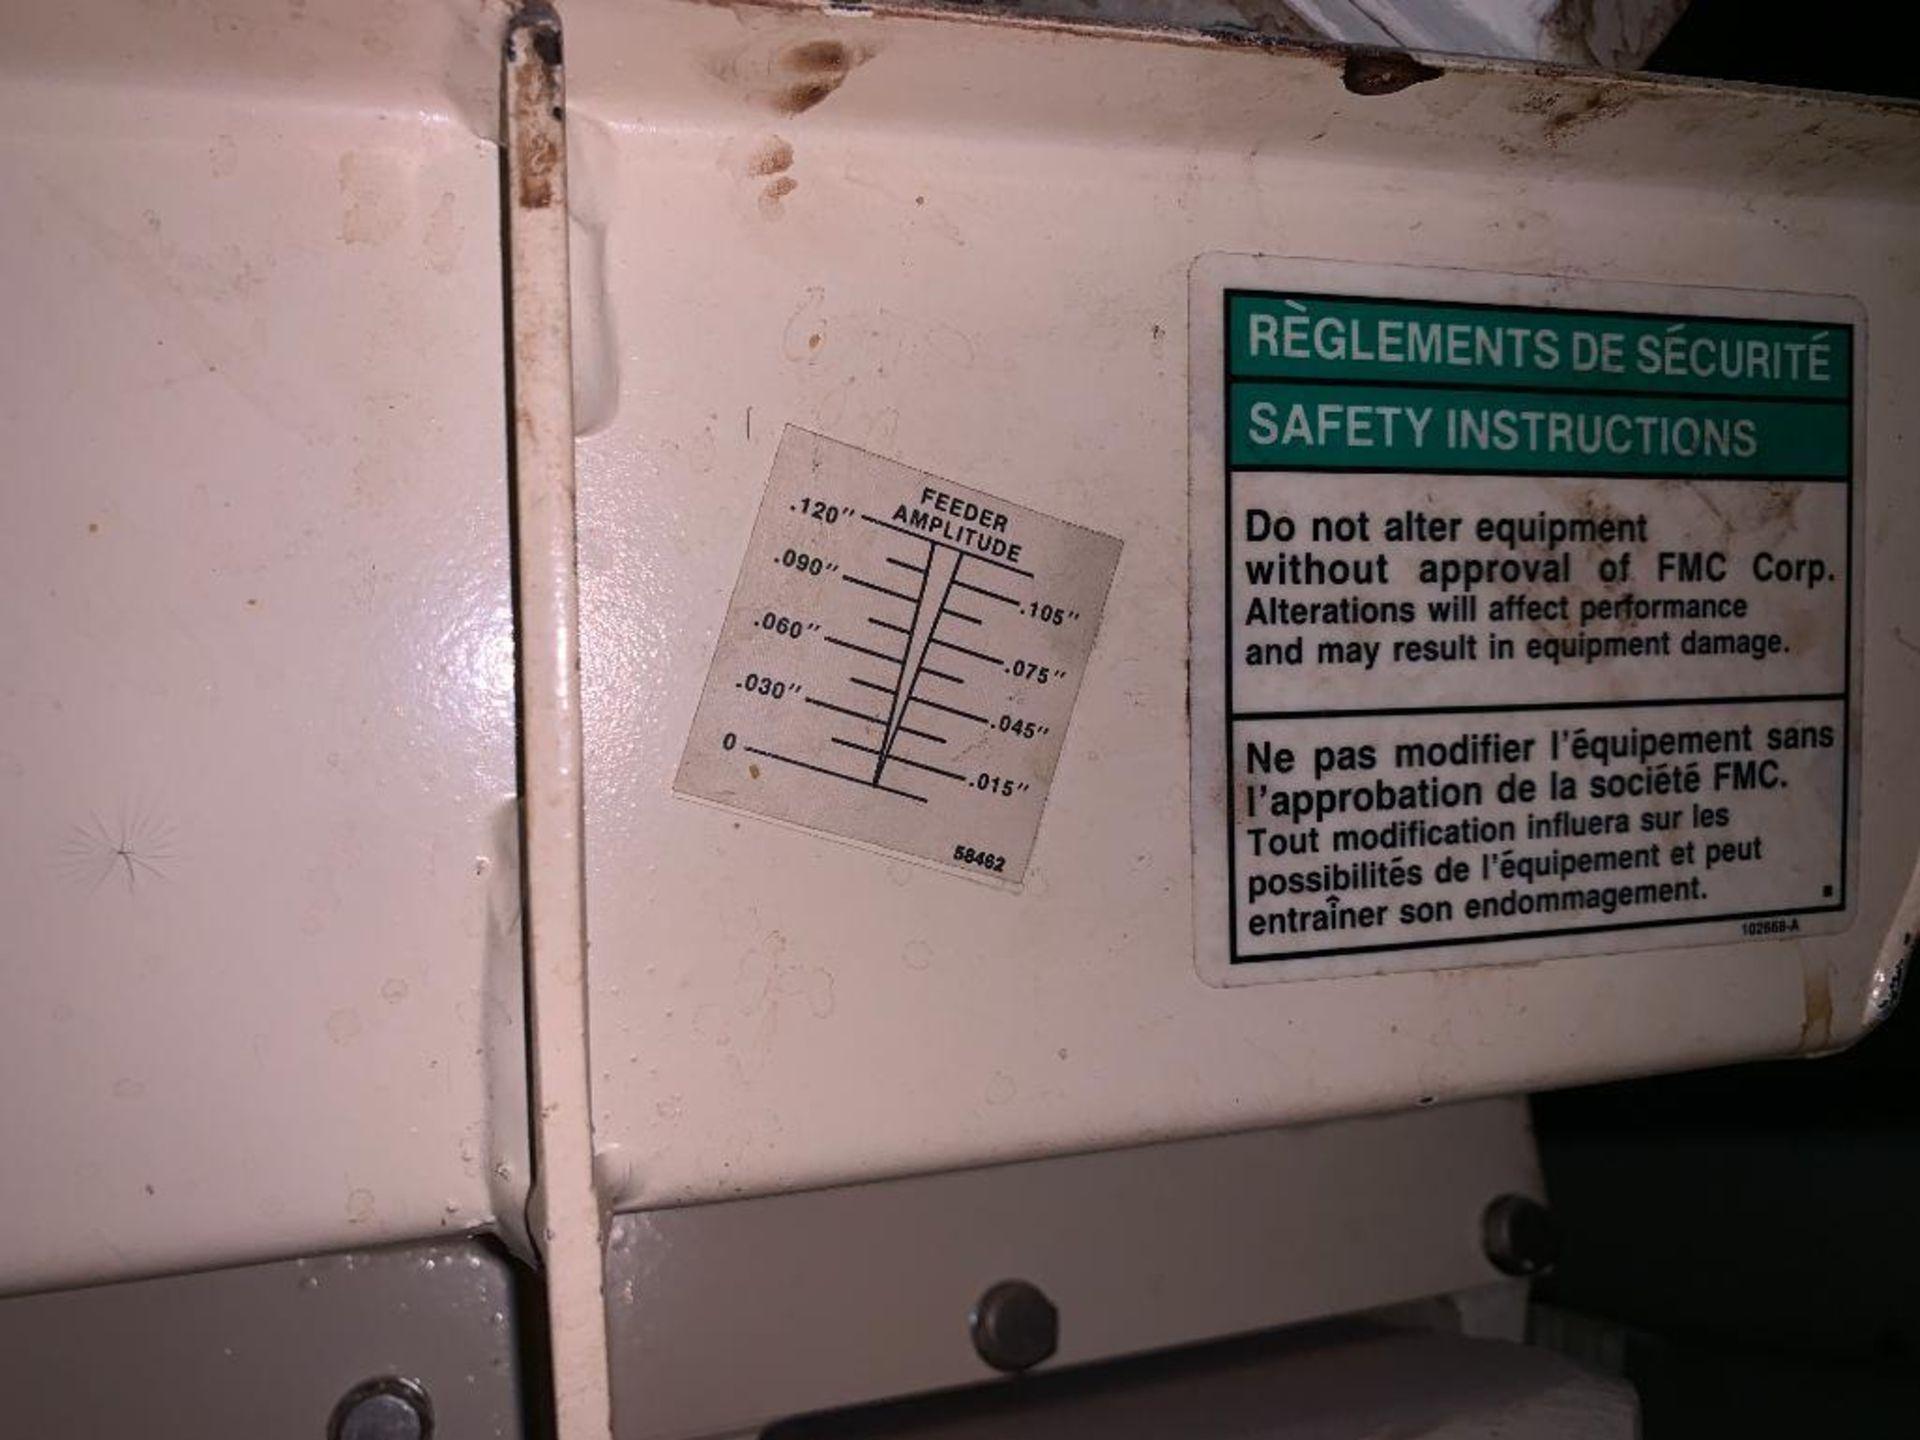 Aseeco mild steel cone bottom bulk storage bin - Image 25 of 25